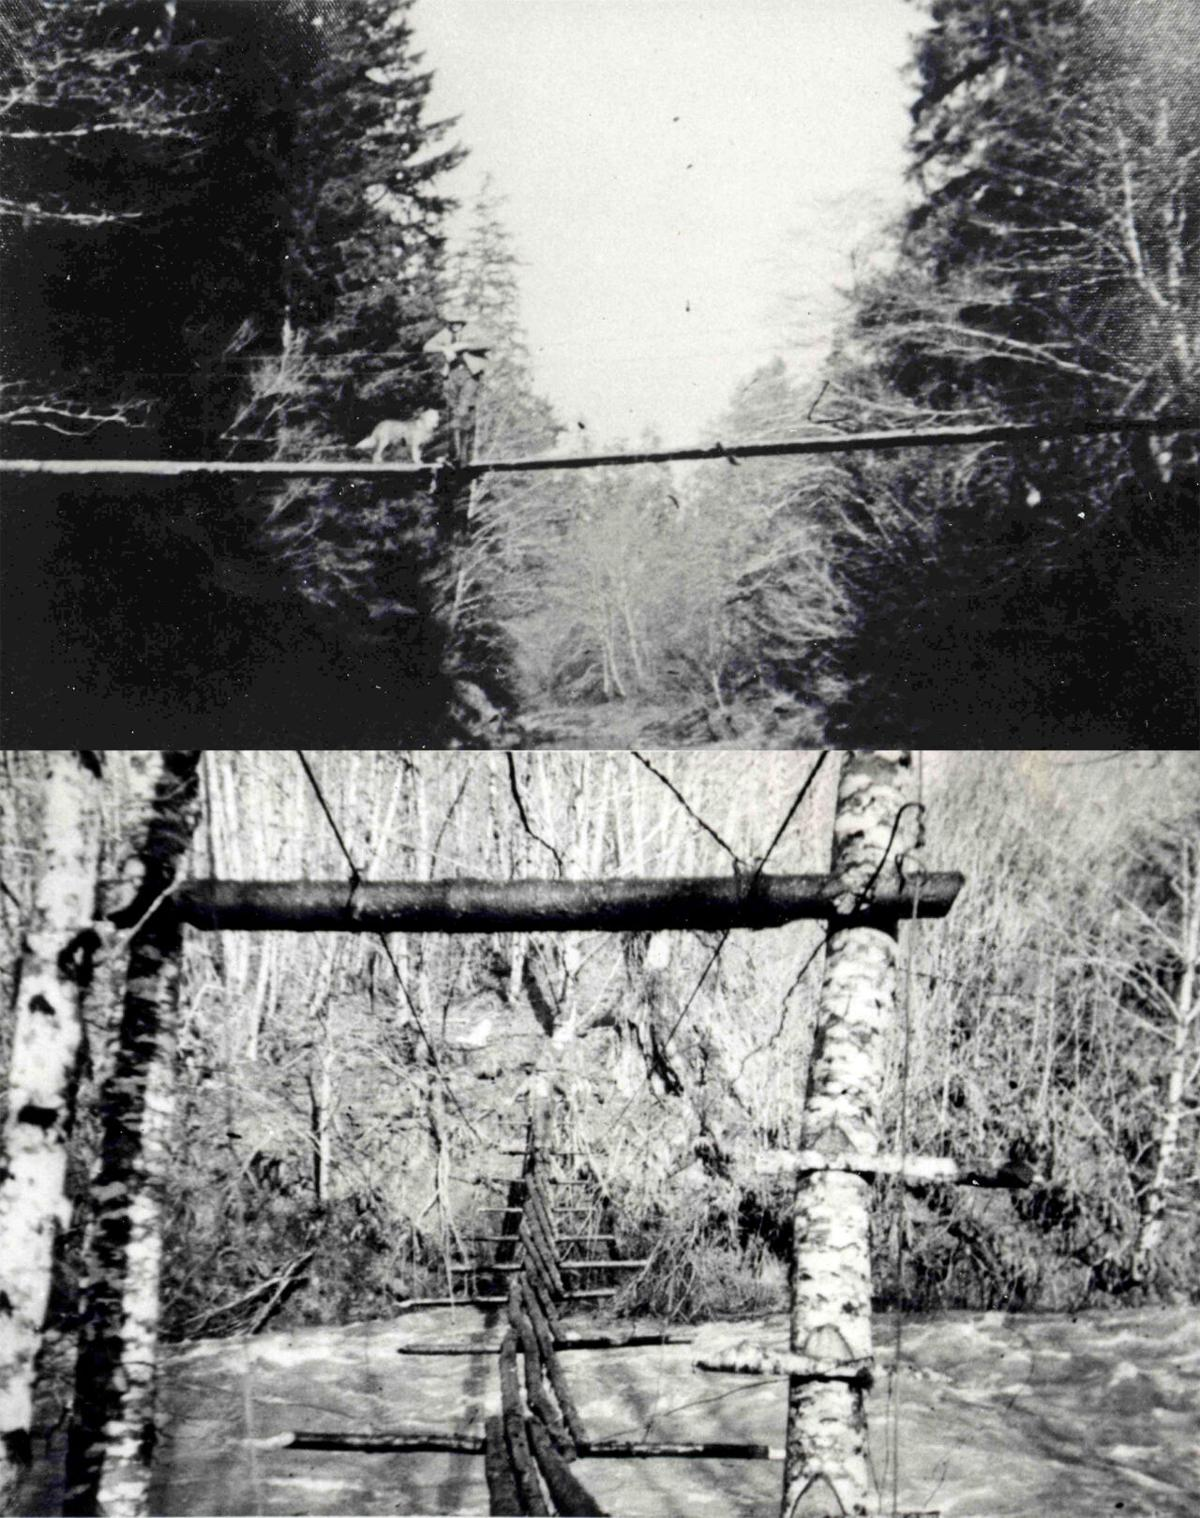 Swinging bridges on the Naselle